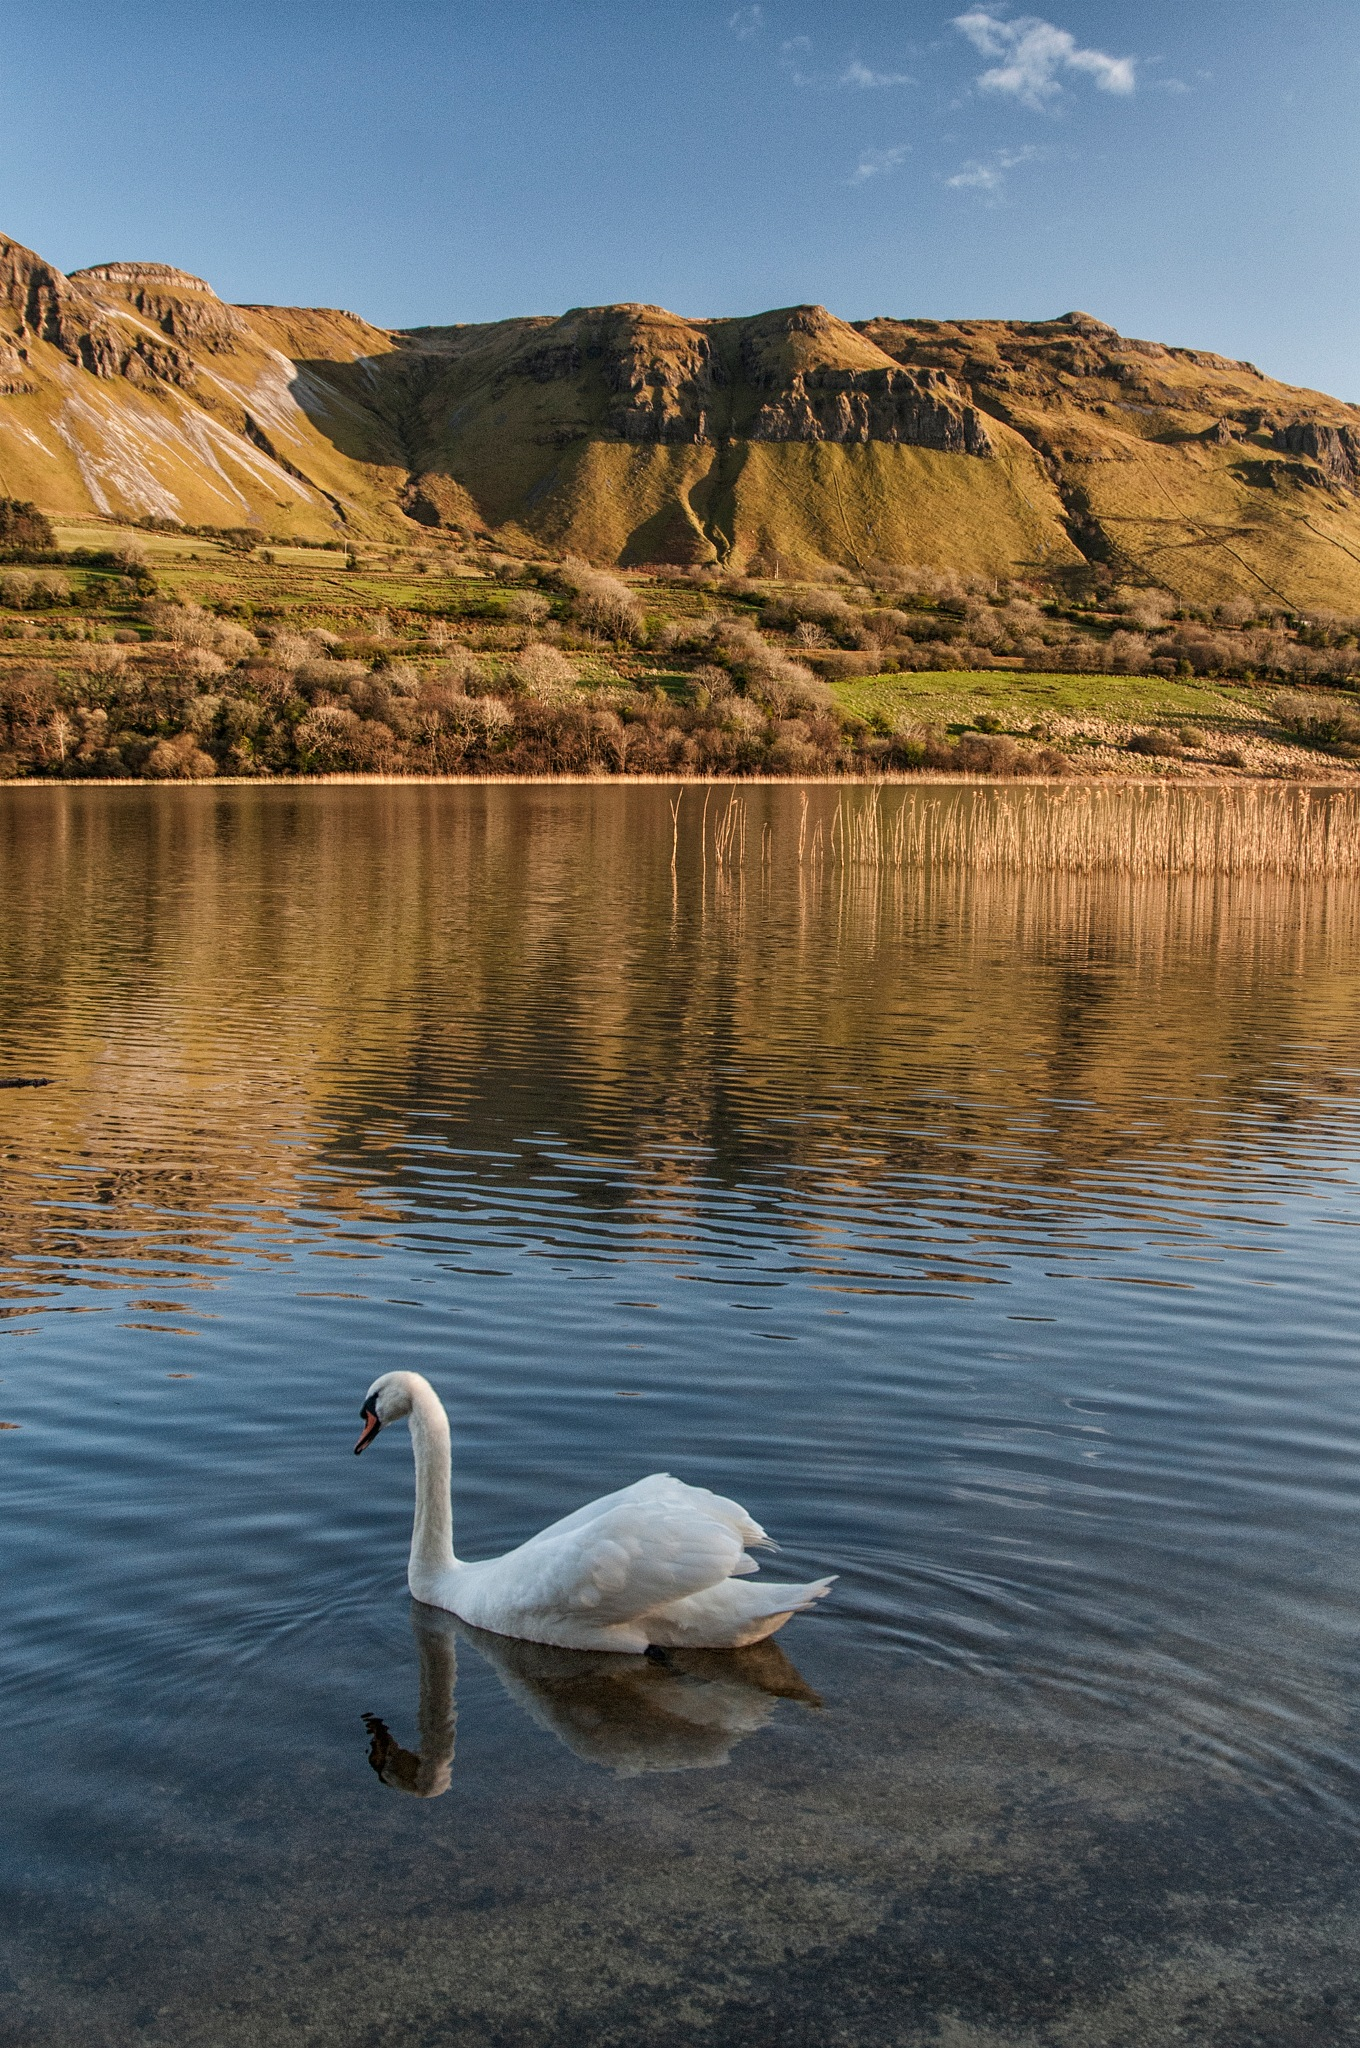 Swan, Sligo by desmcmahon5